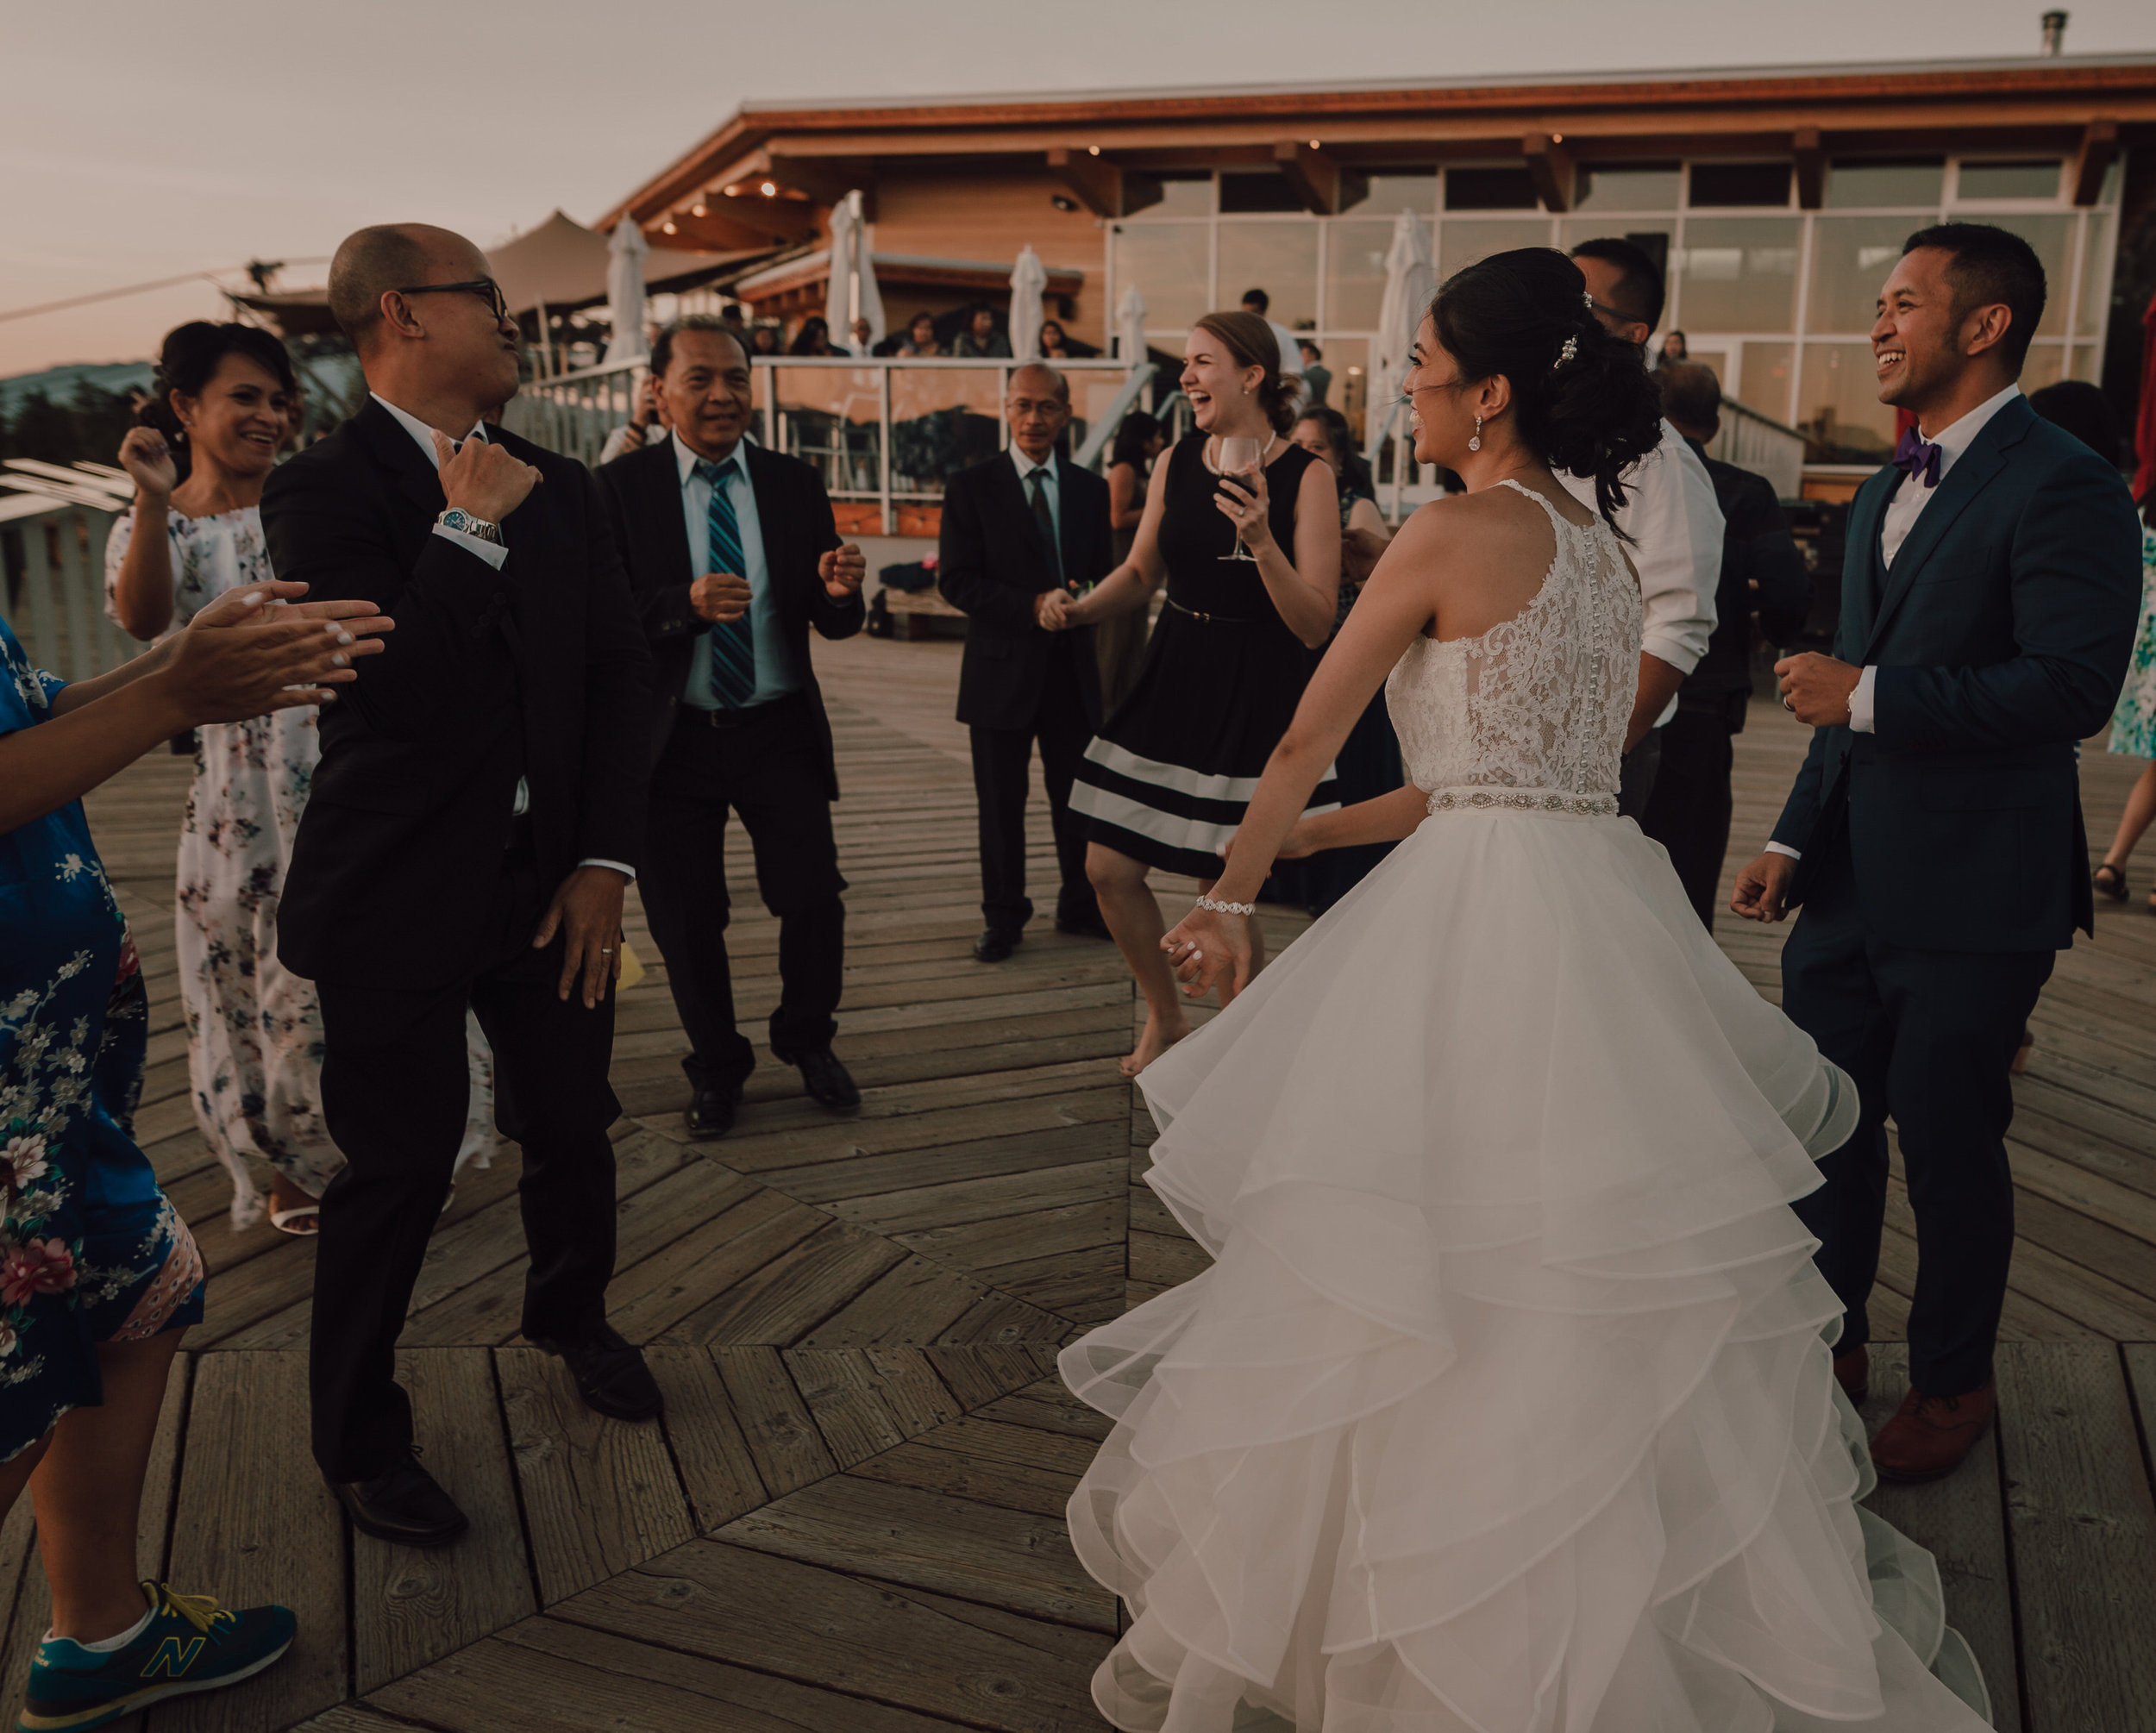 Squamish Wedding Photographer - Sea to Sky Gondola Wedding Photos -  Vancouver Wedding Photographer & Videographer - Sunshine Coast Wedding Photos - Sunshine Coast Wedding Photographer - Jennifer Picard Photography - IMG_5664.jpg